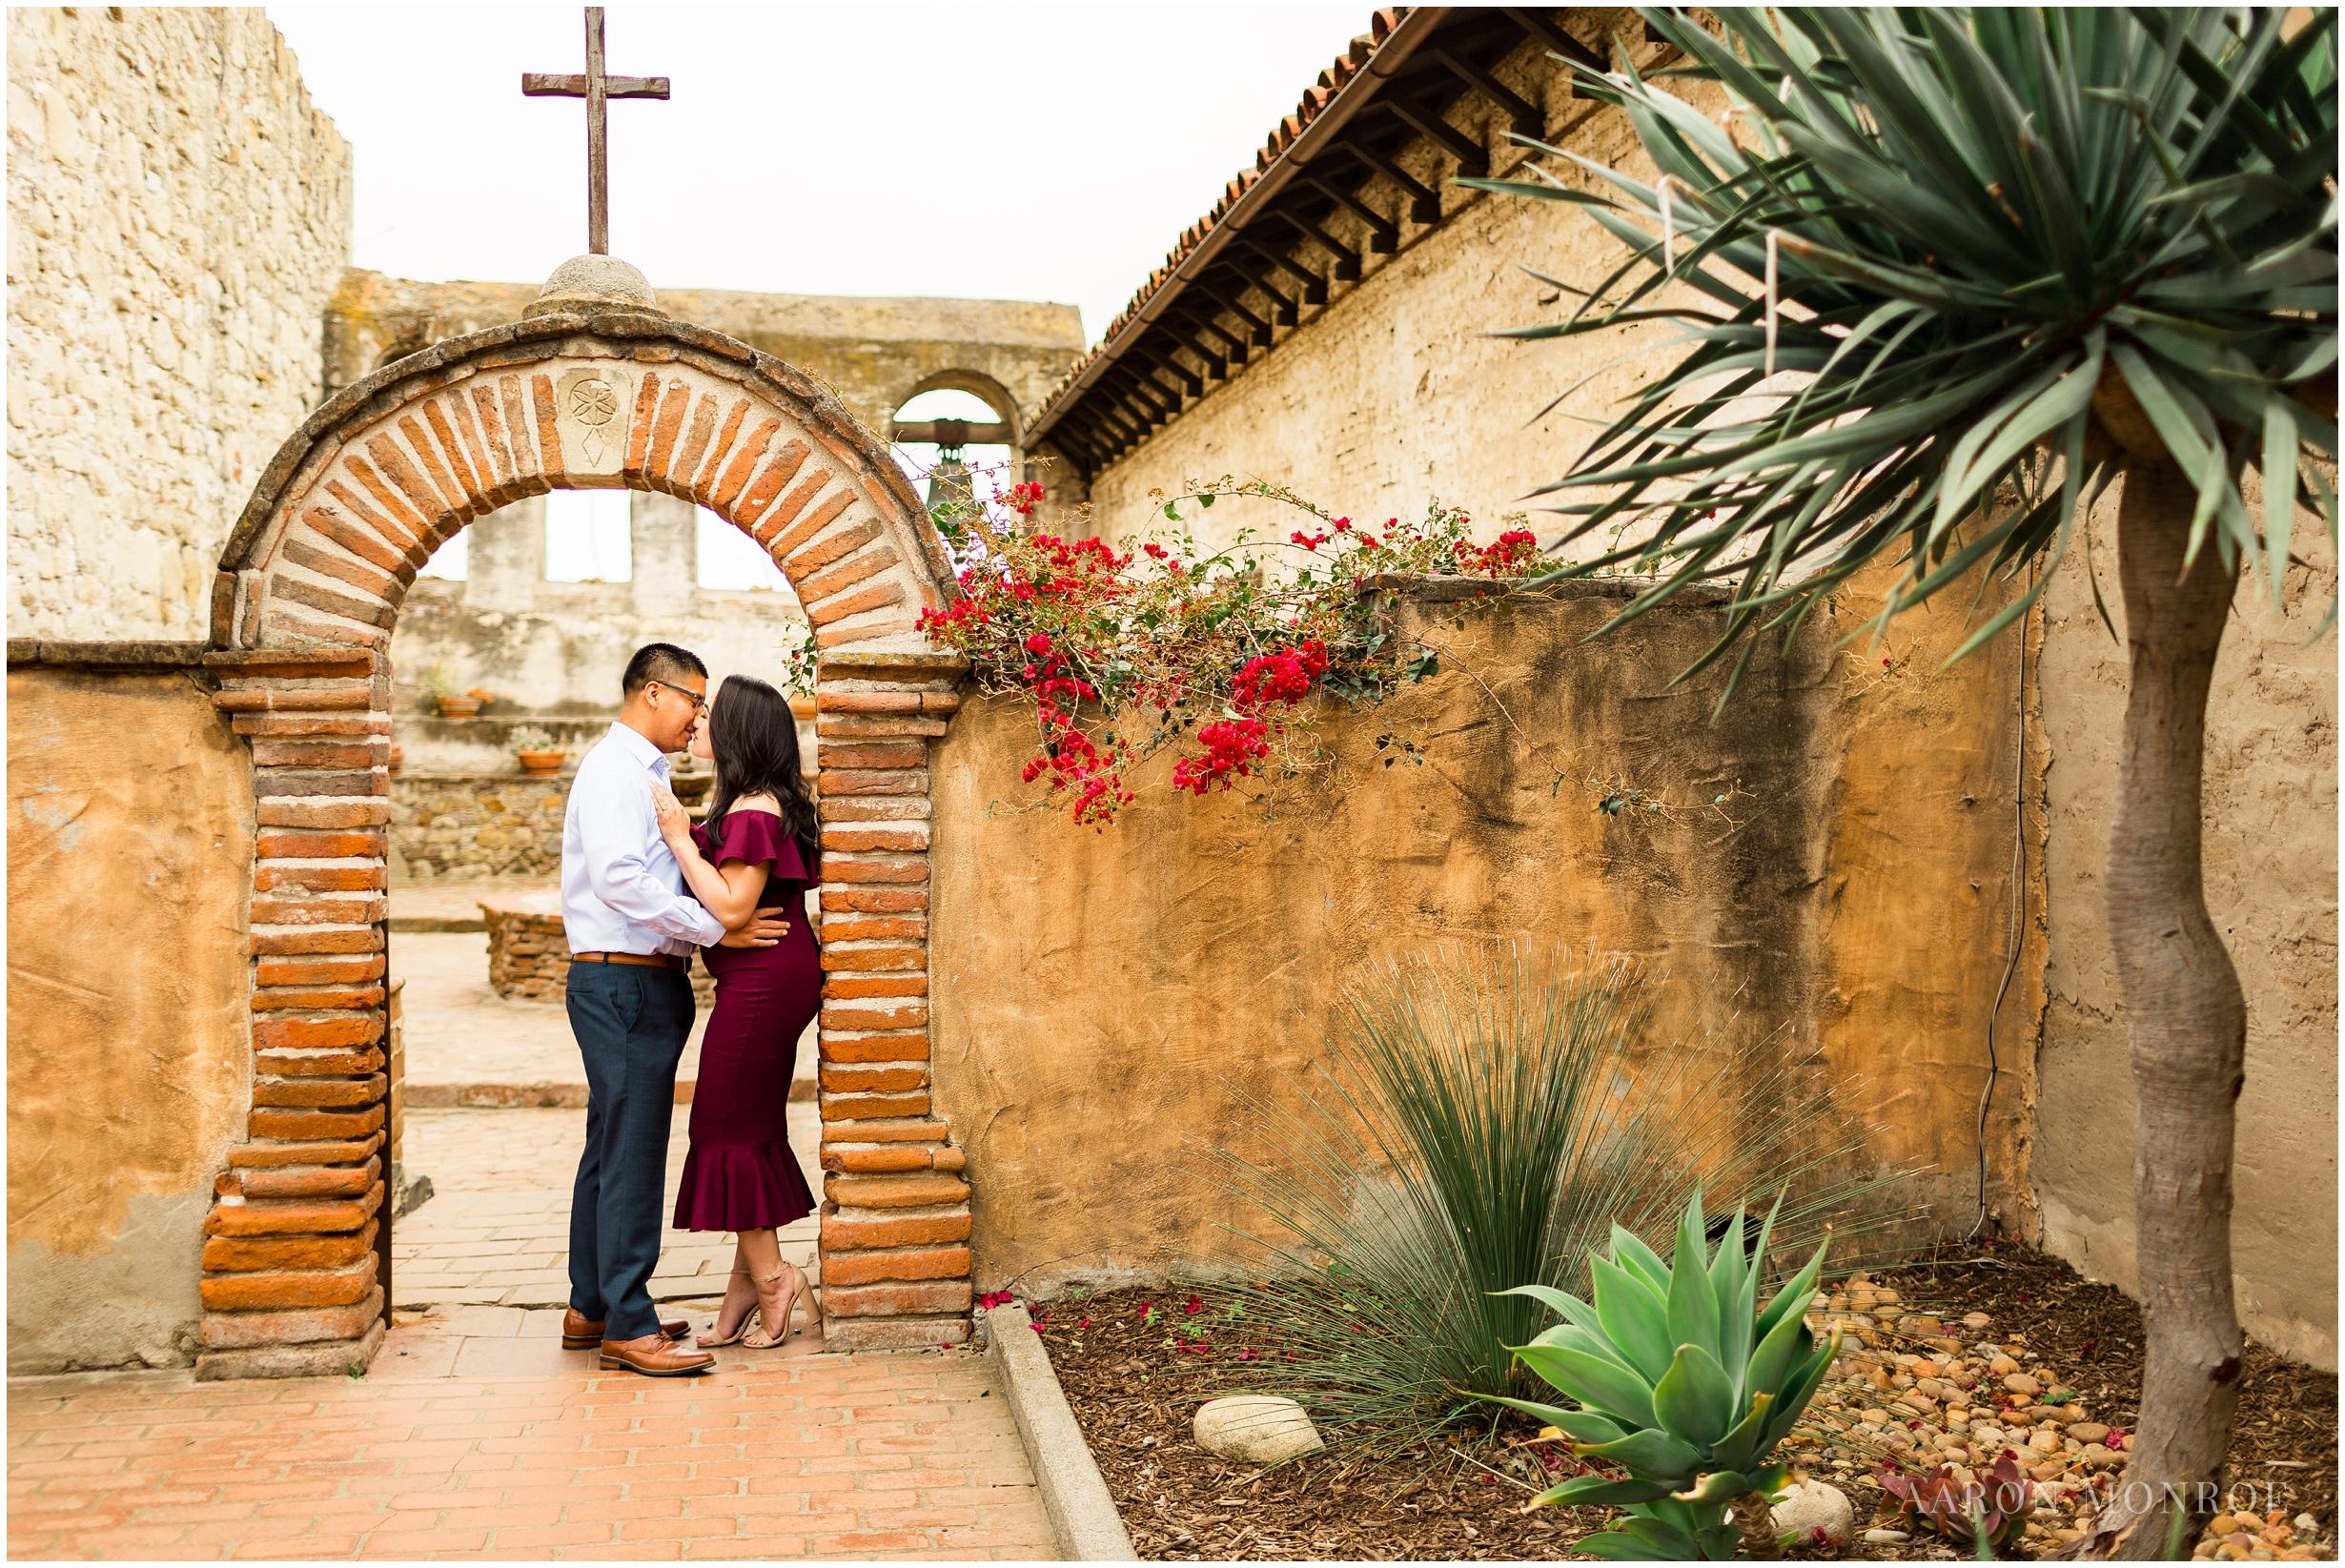 Mission_San_Juan_Capistrano_Engagement_Los_Angeles_Wedding_Photographer_0351.jpg